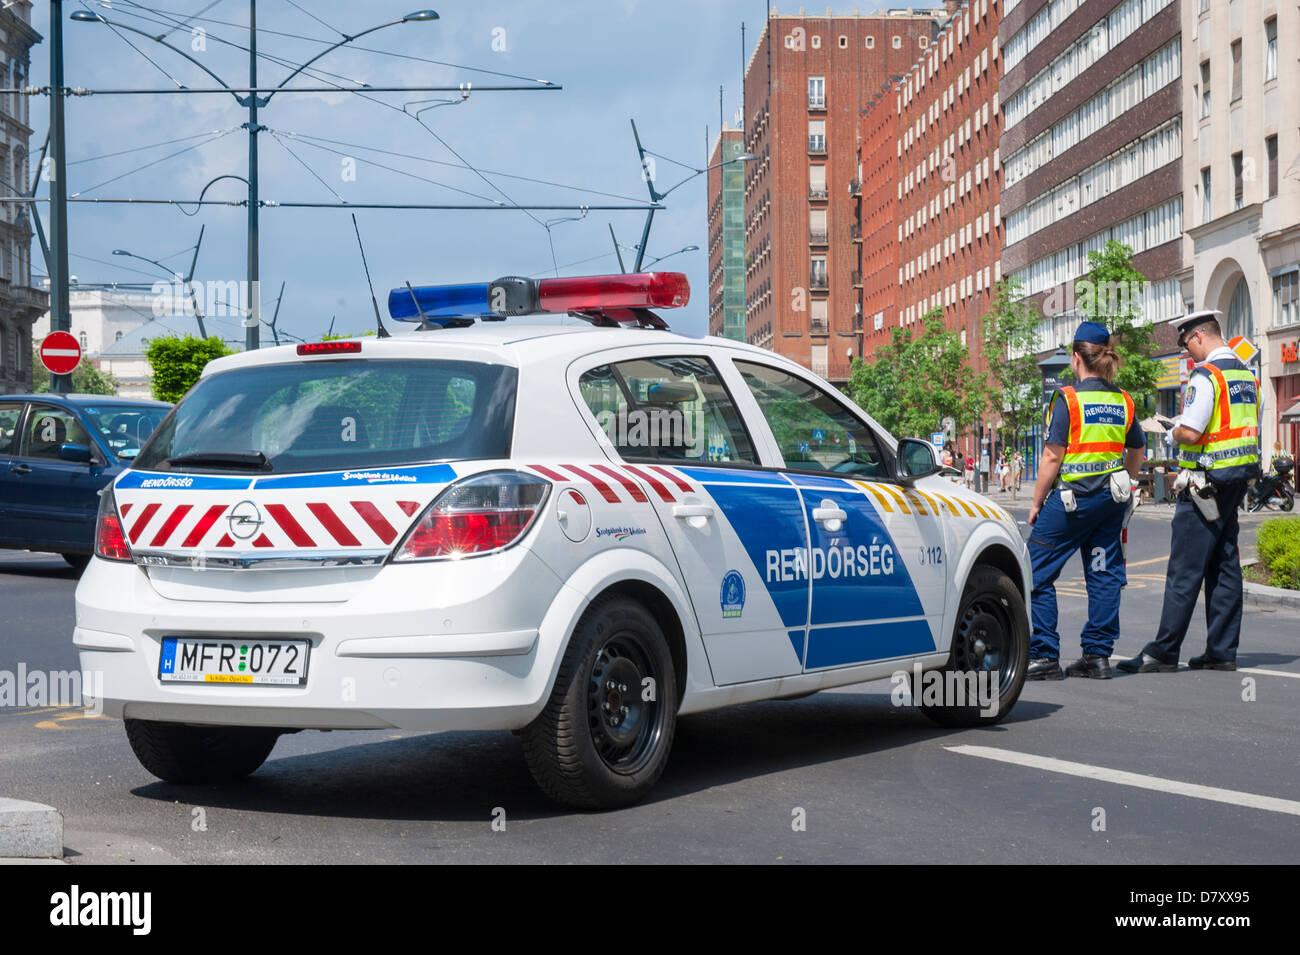 Gran Sinagoga de Budapest Hungría Zsinagoga Rendorseg coche policial hombre mujer guardia centinelas centinelas Imagen De Stock